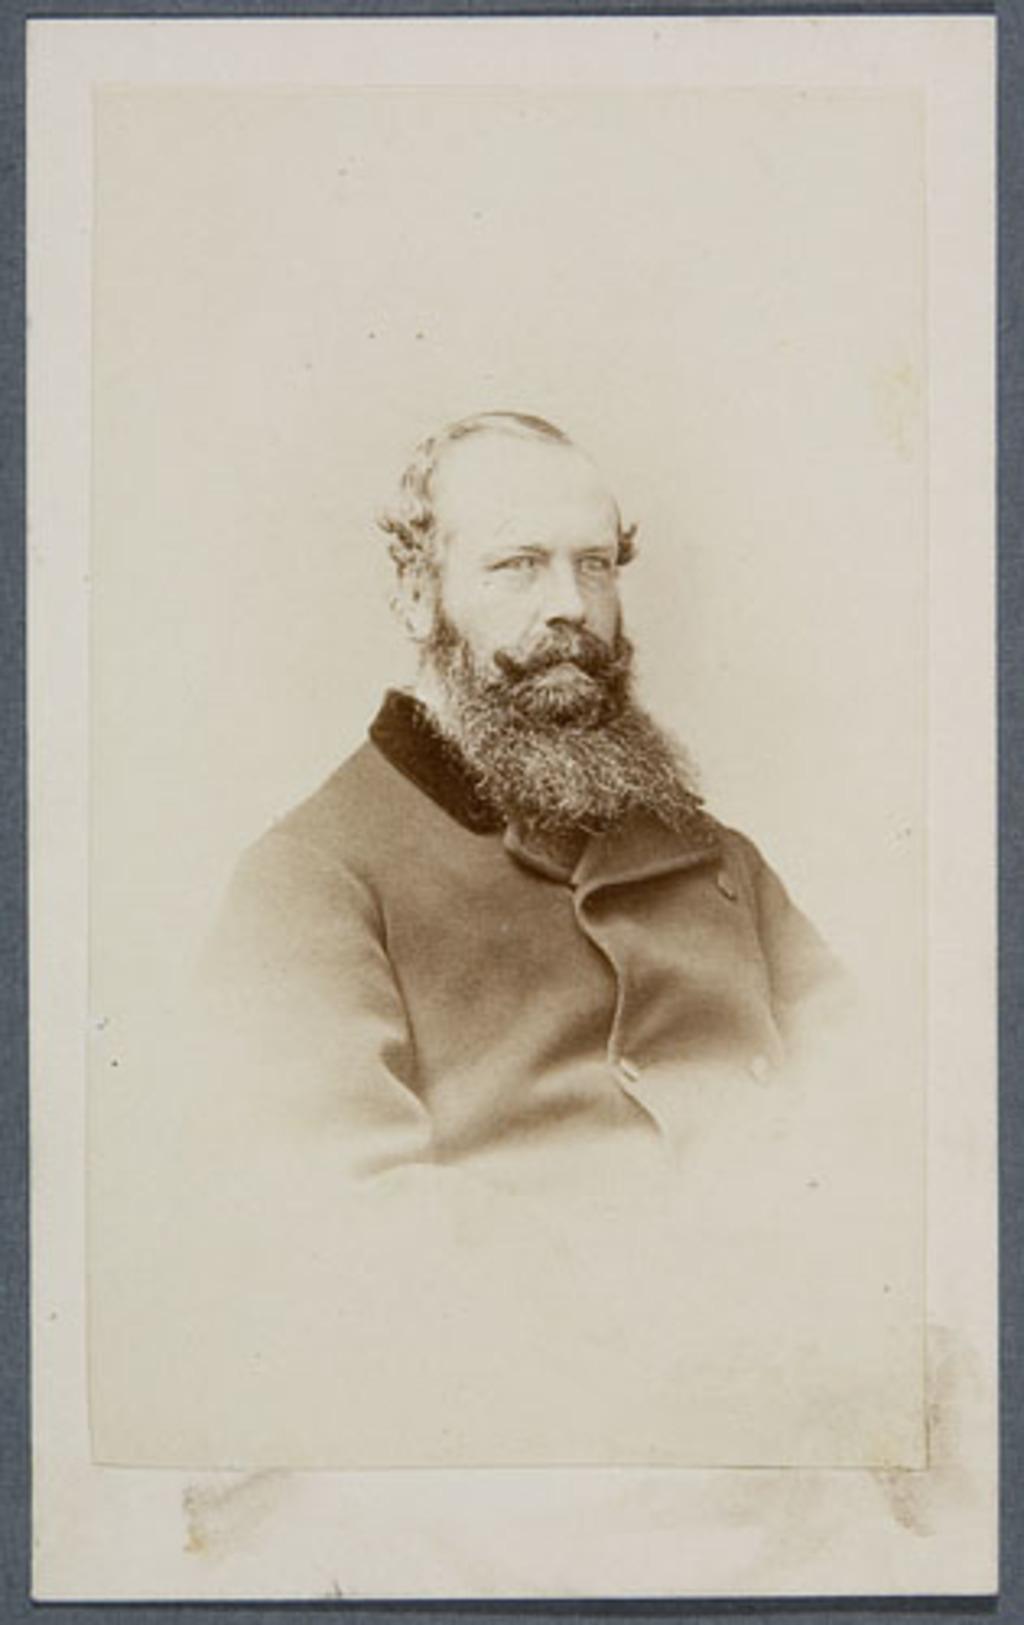 Lord Charles Stanley Monck, de l'album Eugène-Hamel